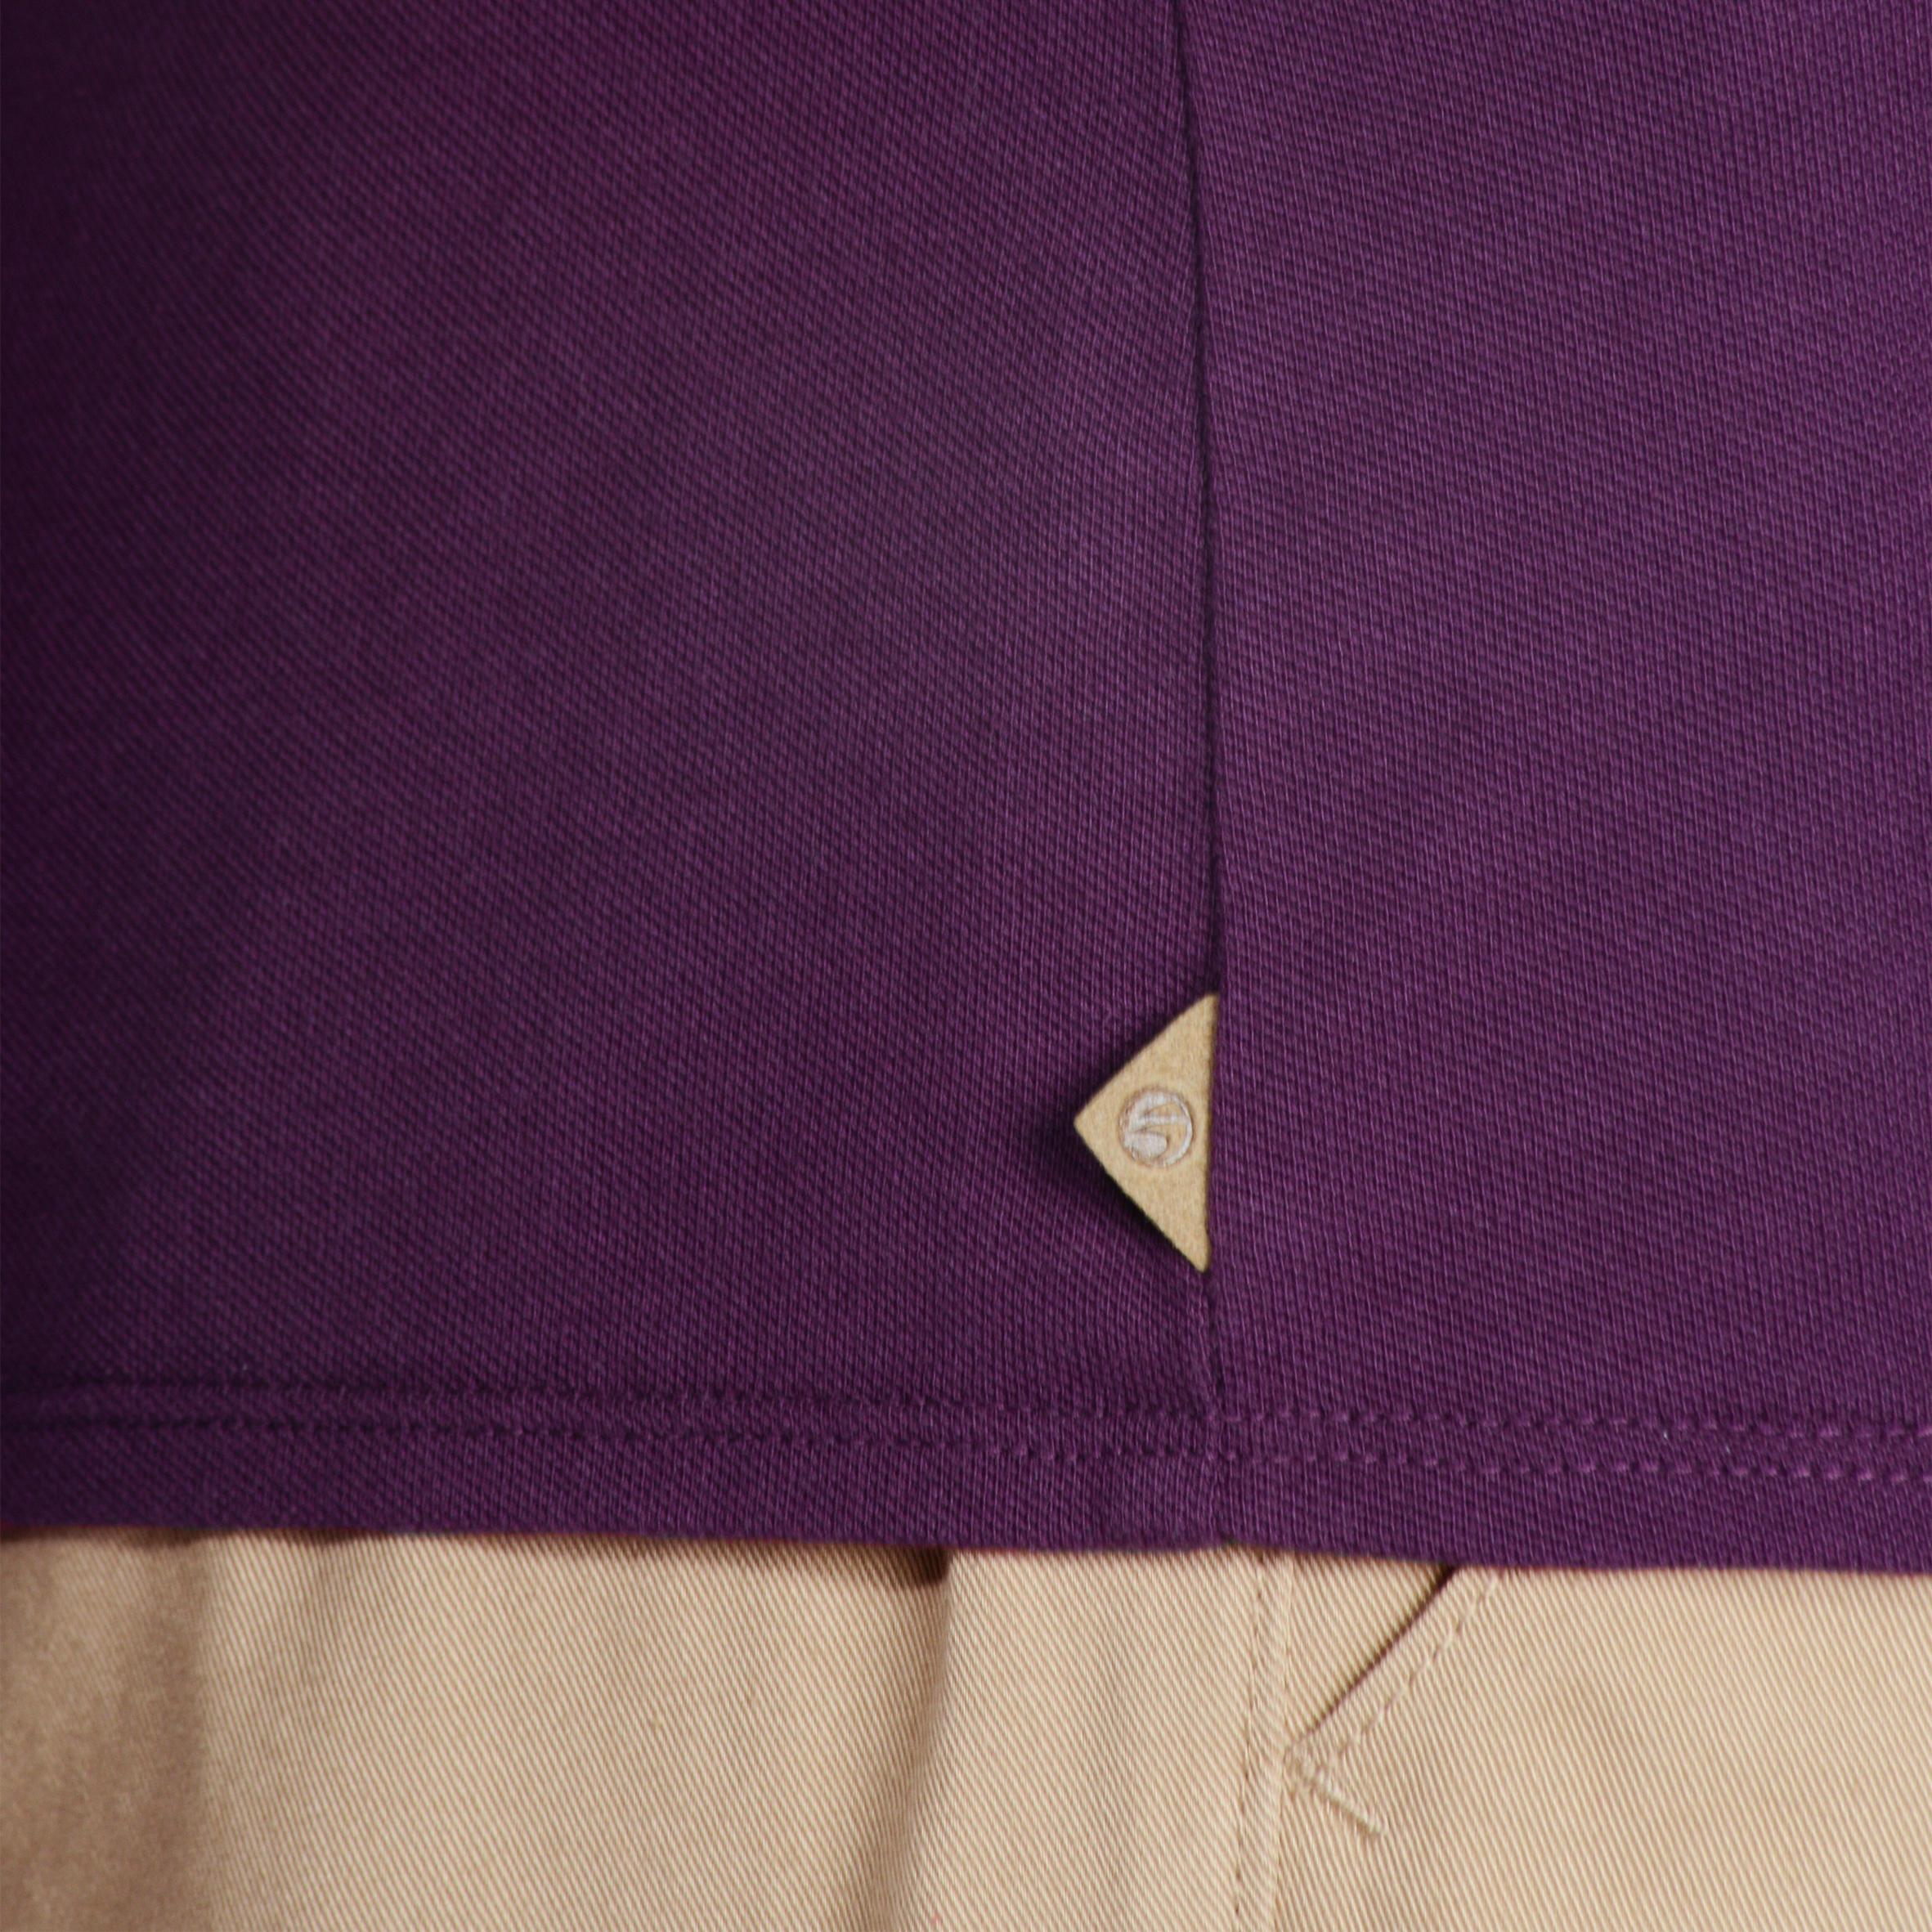 Women's Golf Polo T-Shirt 500 - Violet